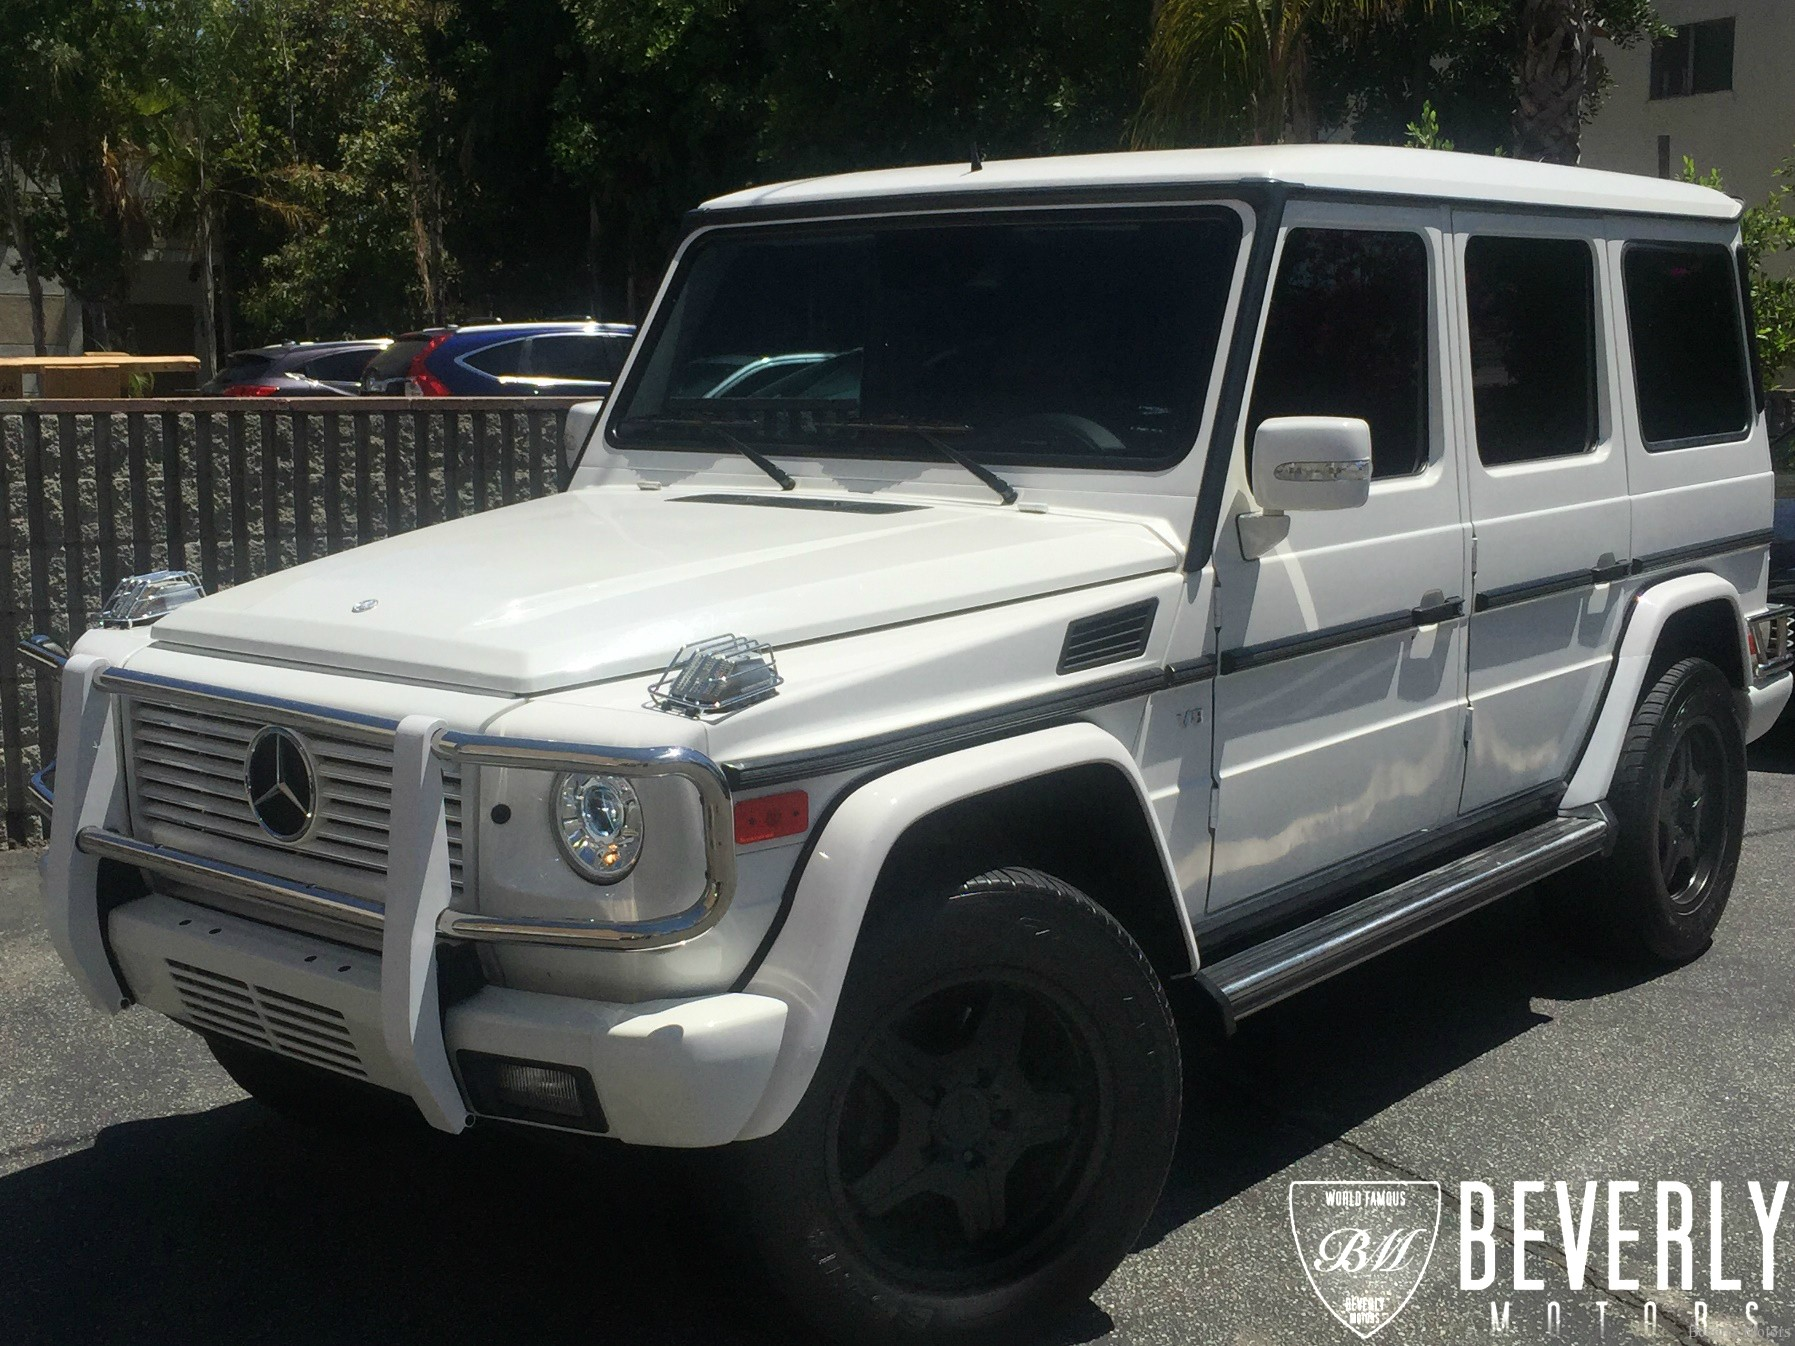 2003 mercedes benz g500 g63 g550 g55 g class amg g wagen white